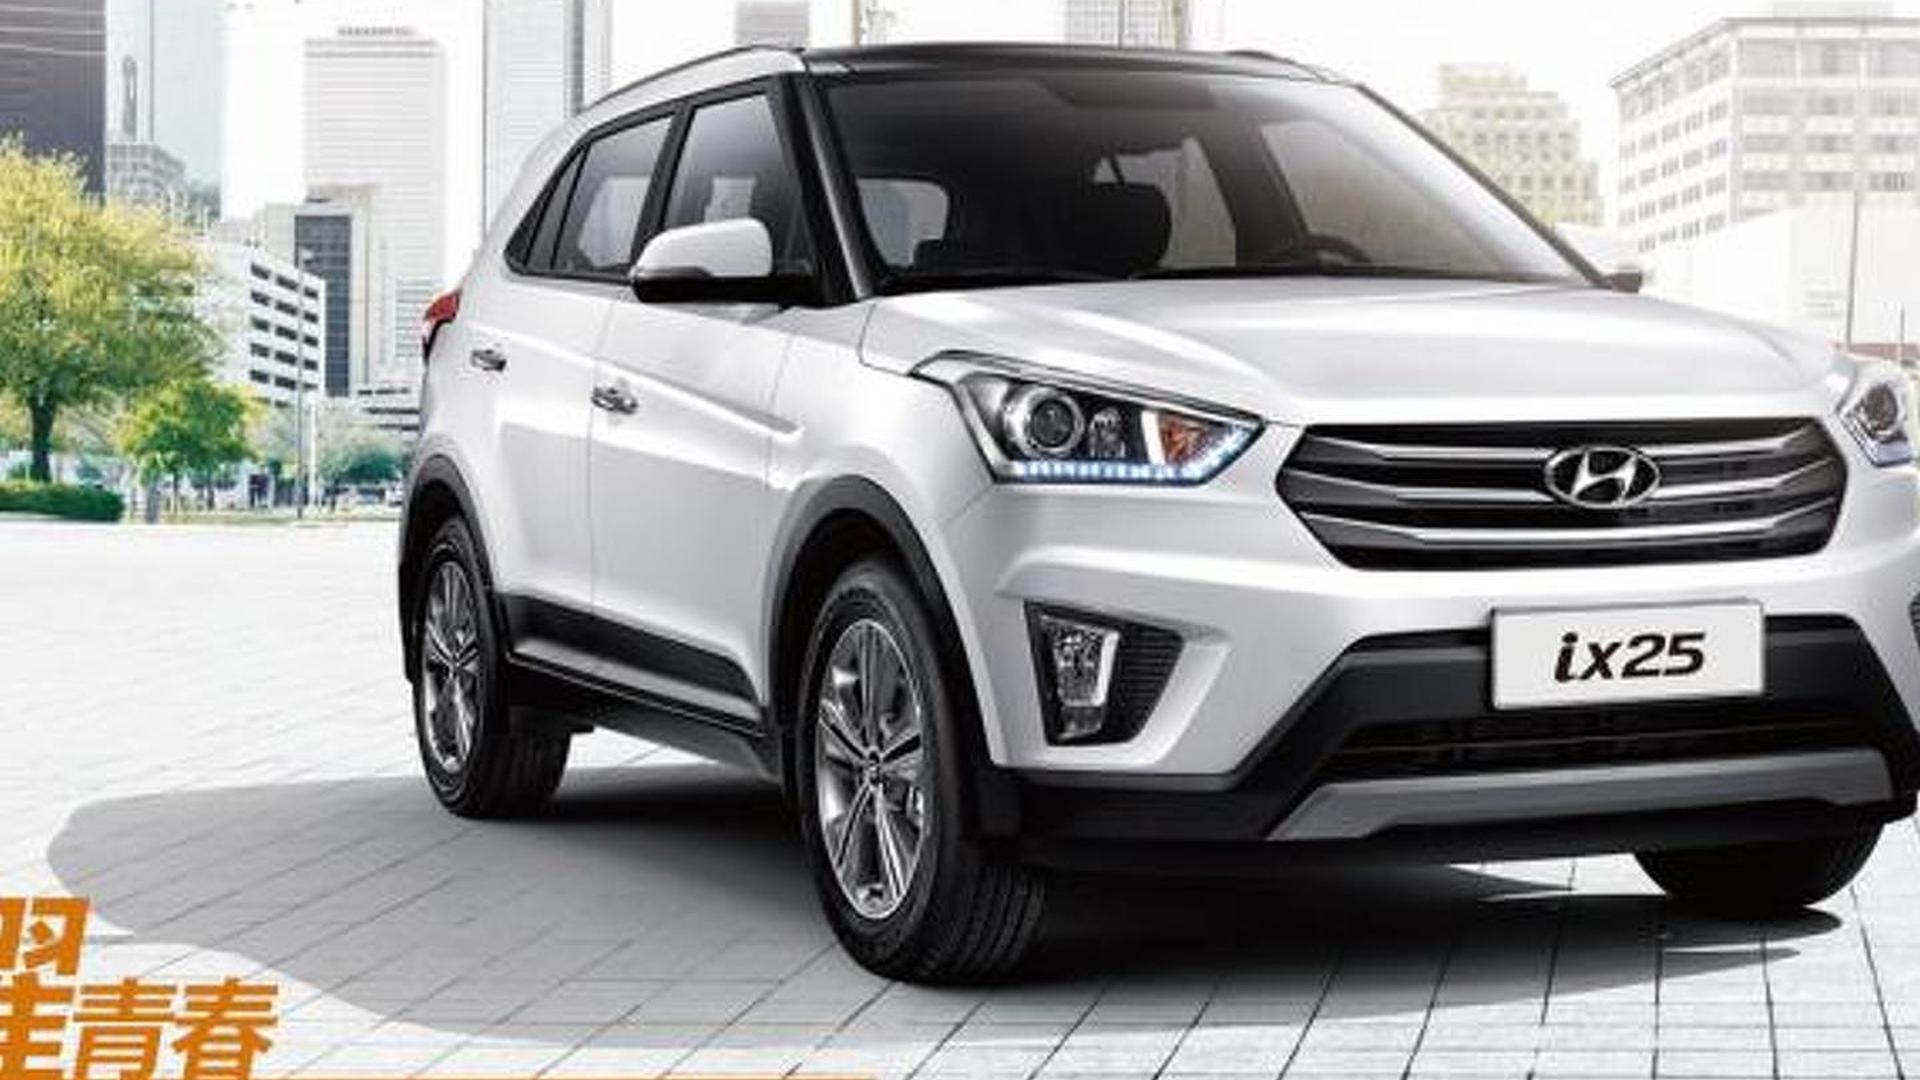 Hyundai Ix25 Heading To Europe And United States In 2017